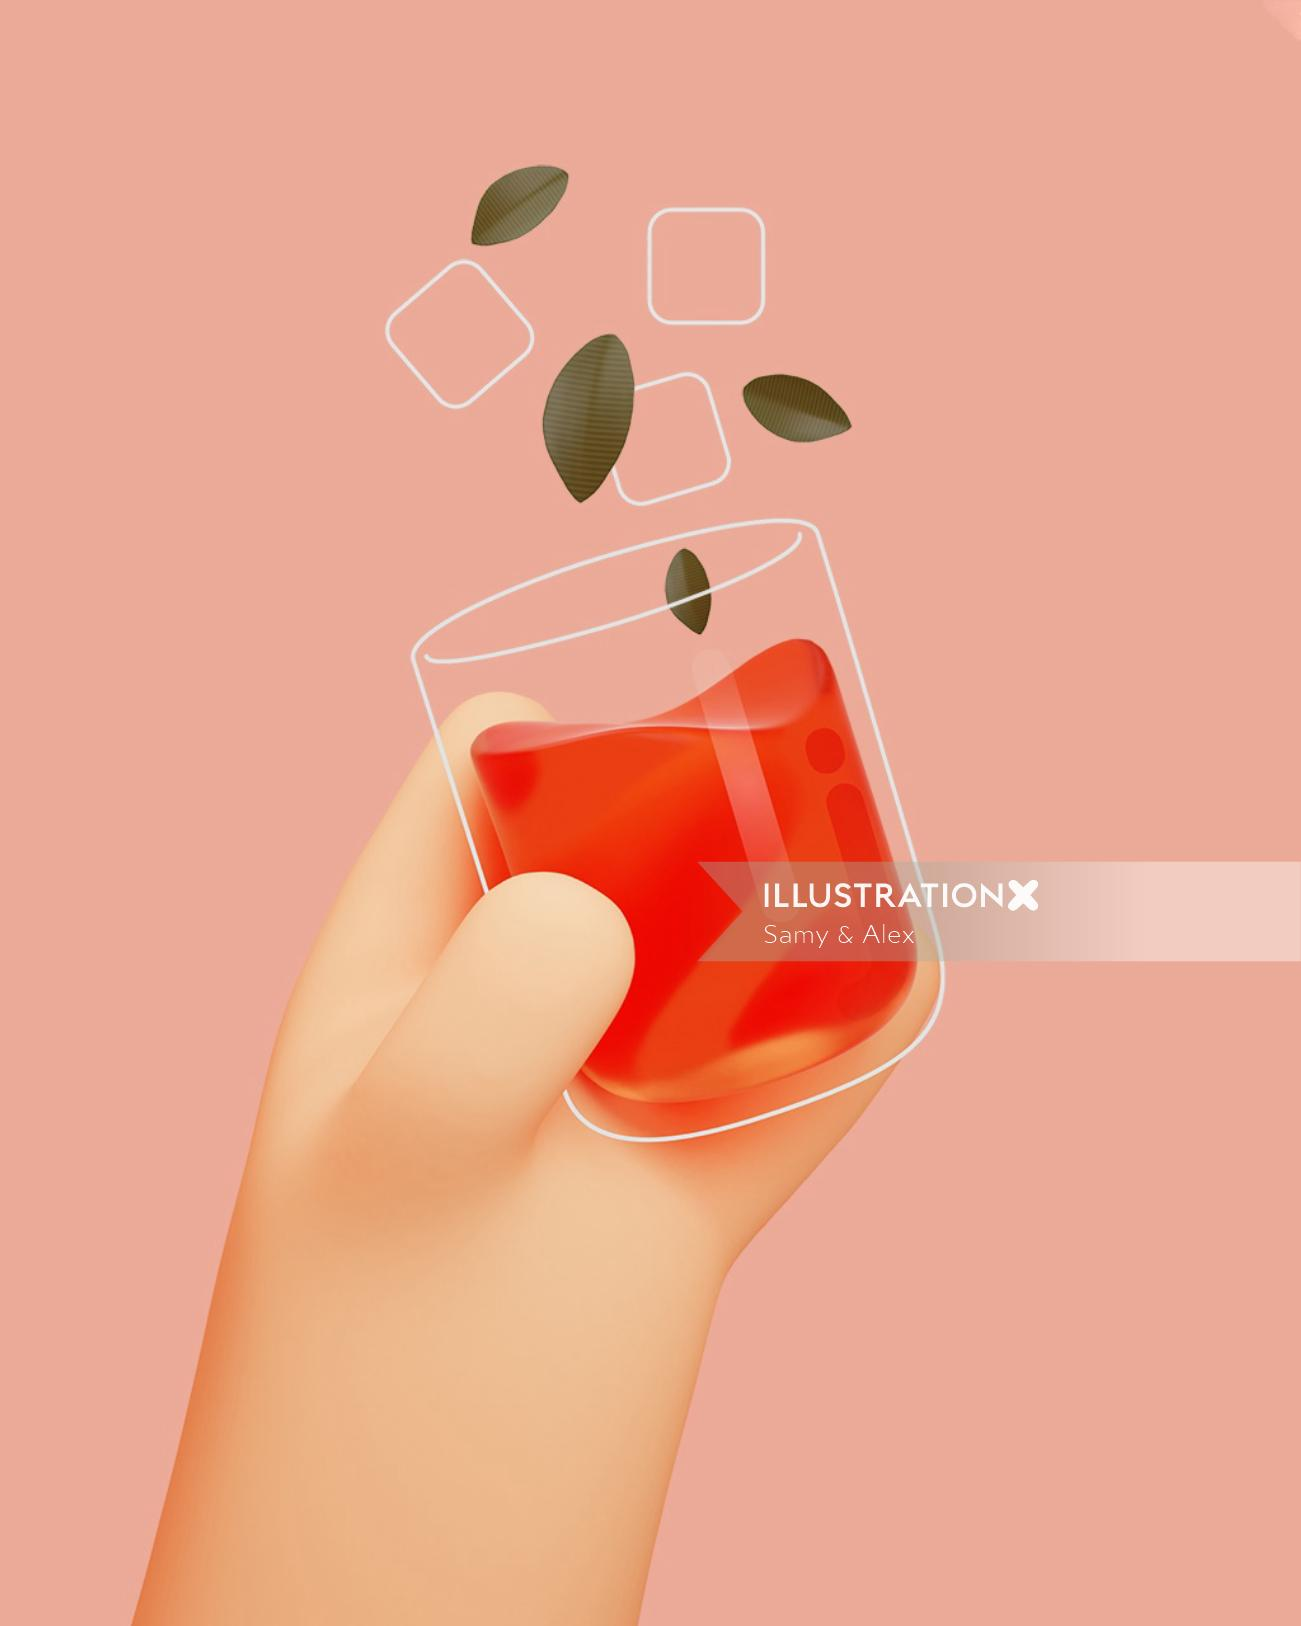 3d illustration of wine glass